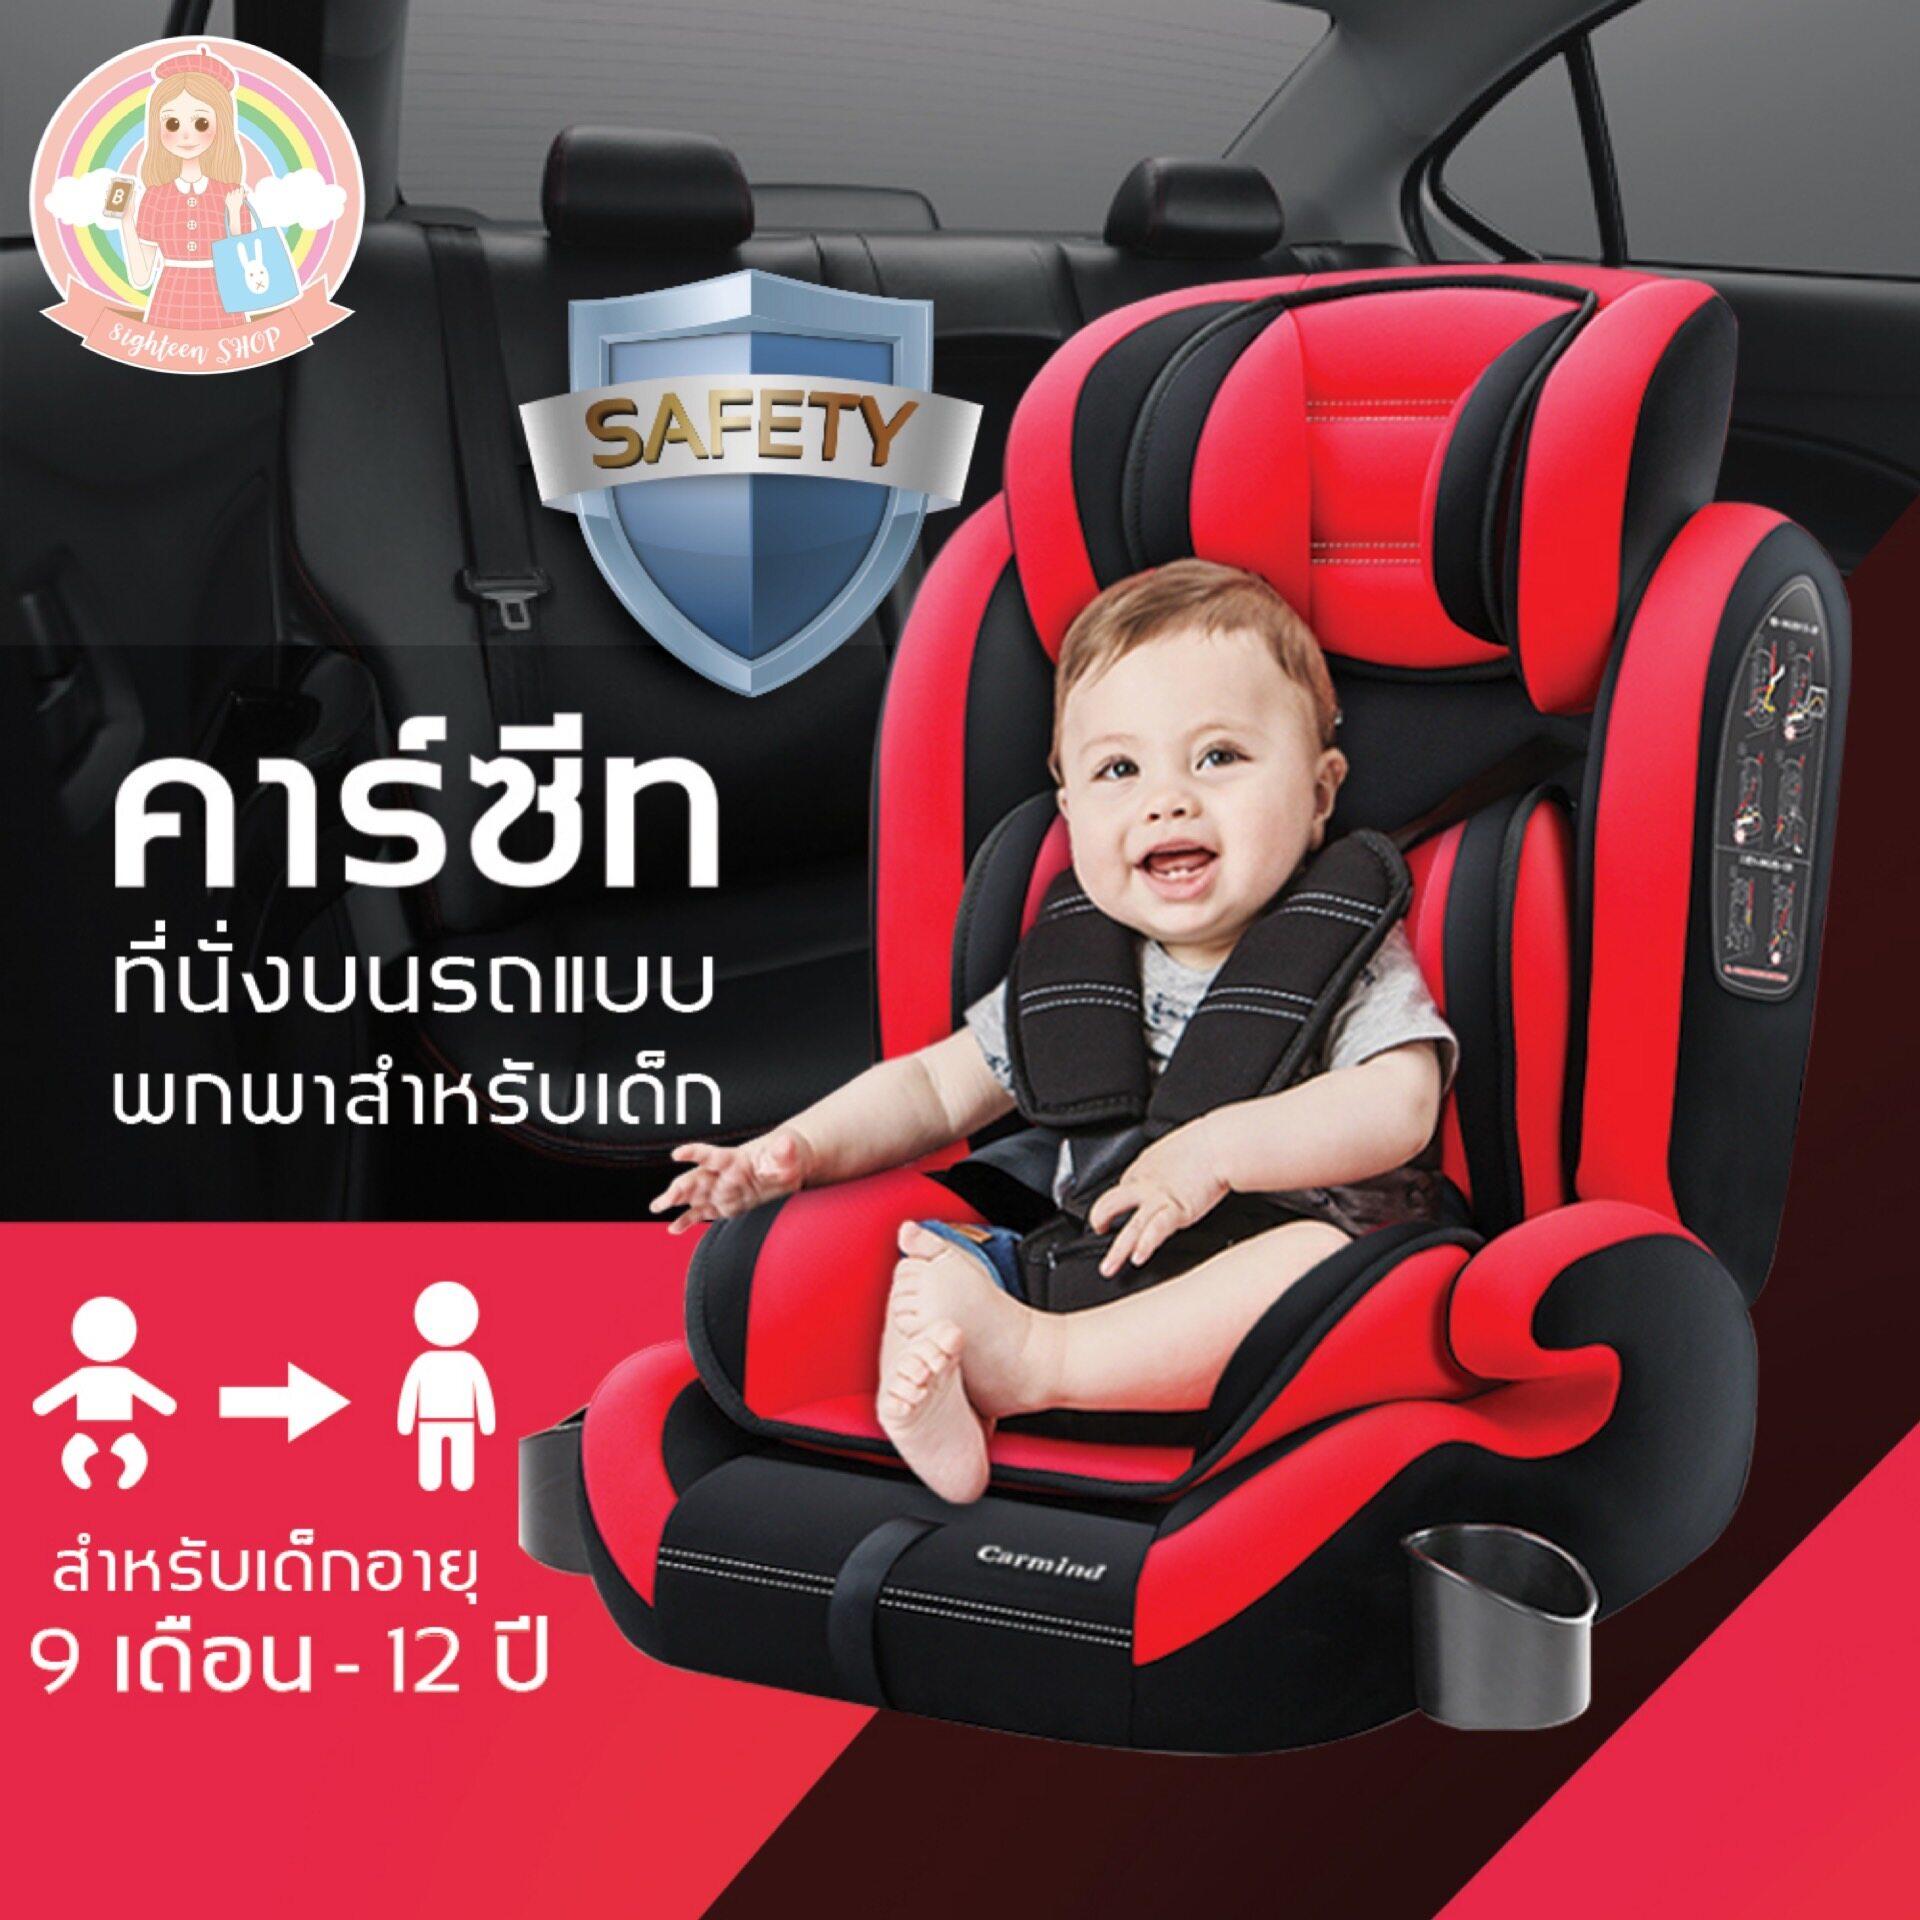 Car Seat คาร์ซีทเด็ก ใช้ได้กับรถยนต์ทุกรุ่น สำหรับเด็กช่วงอายุ 9 เดือน - 12ปี 8ighteen.